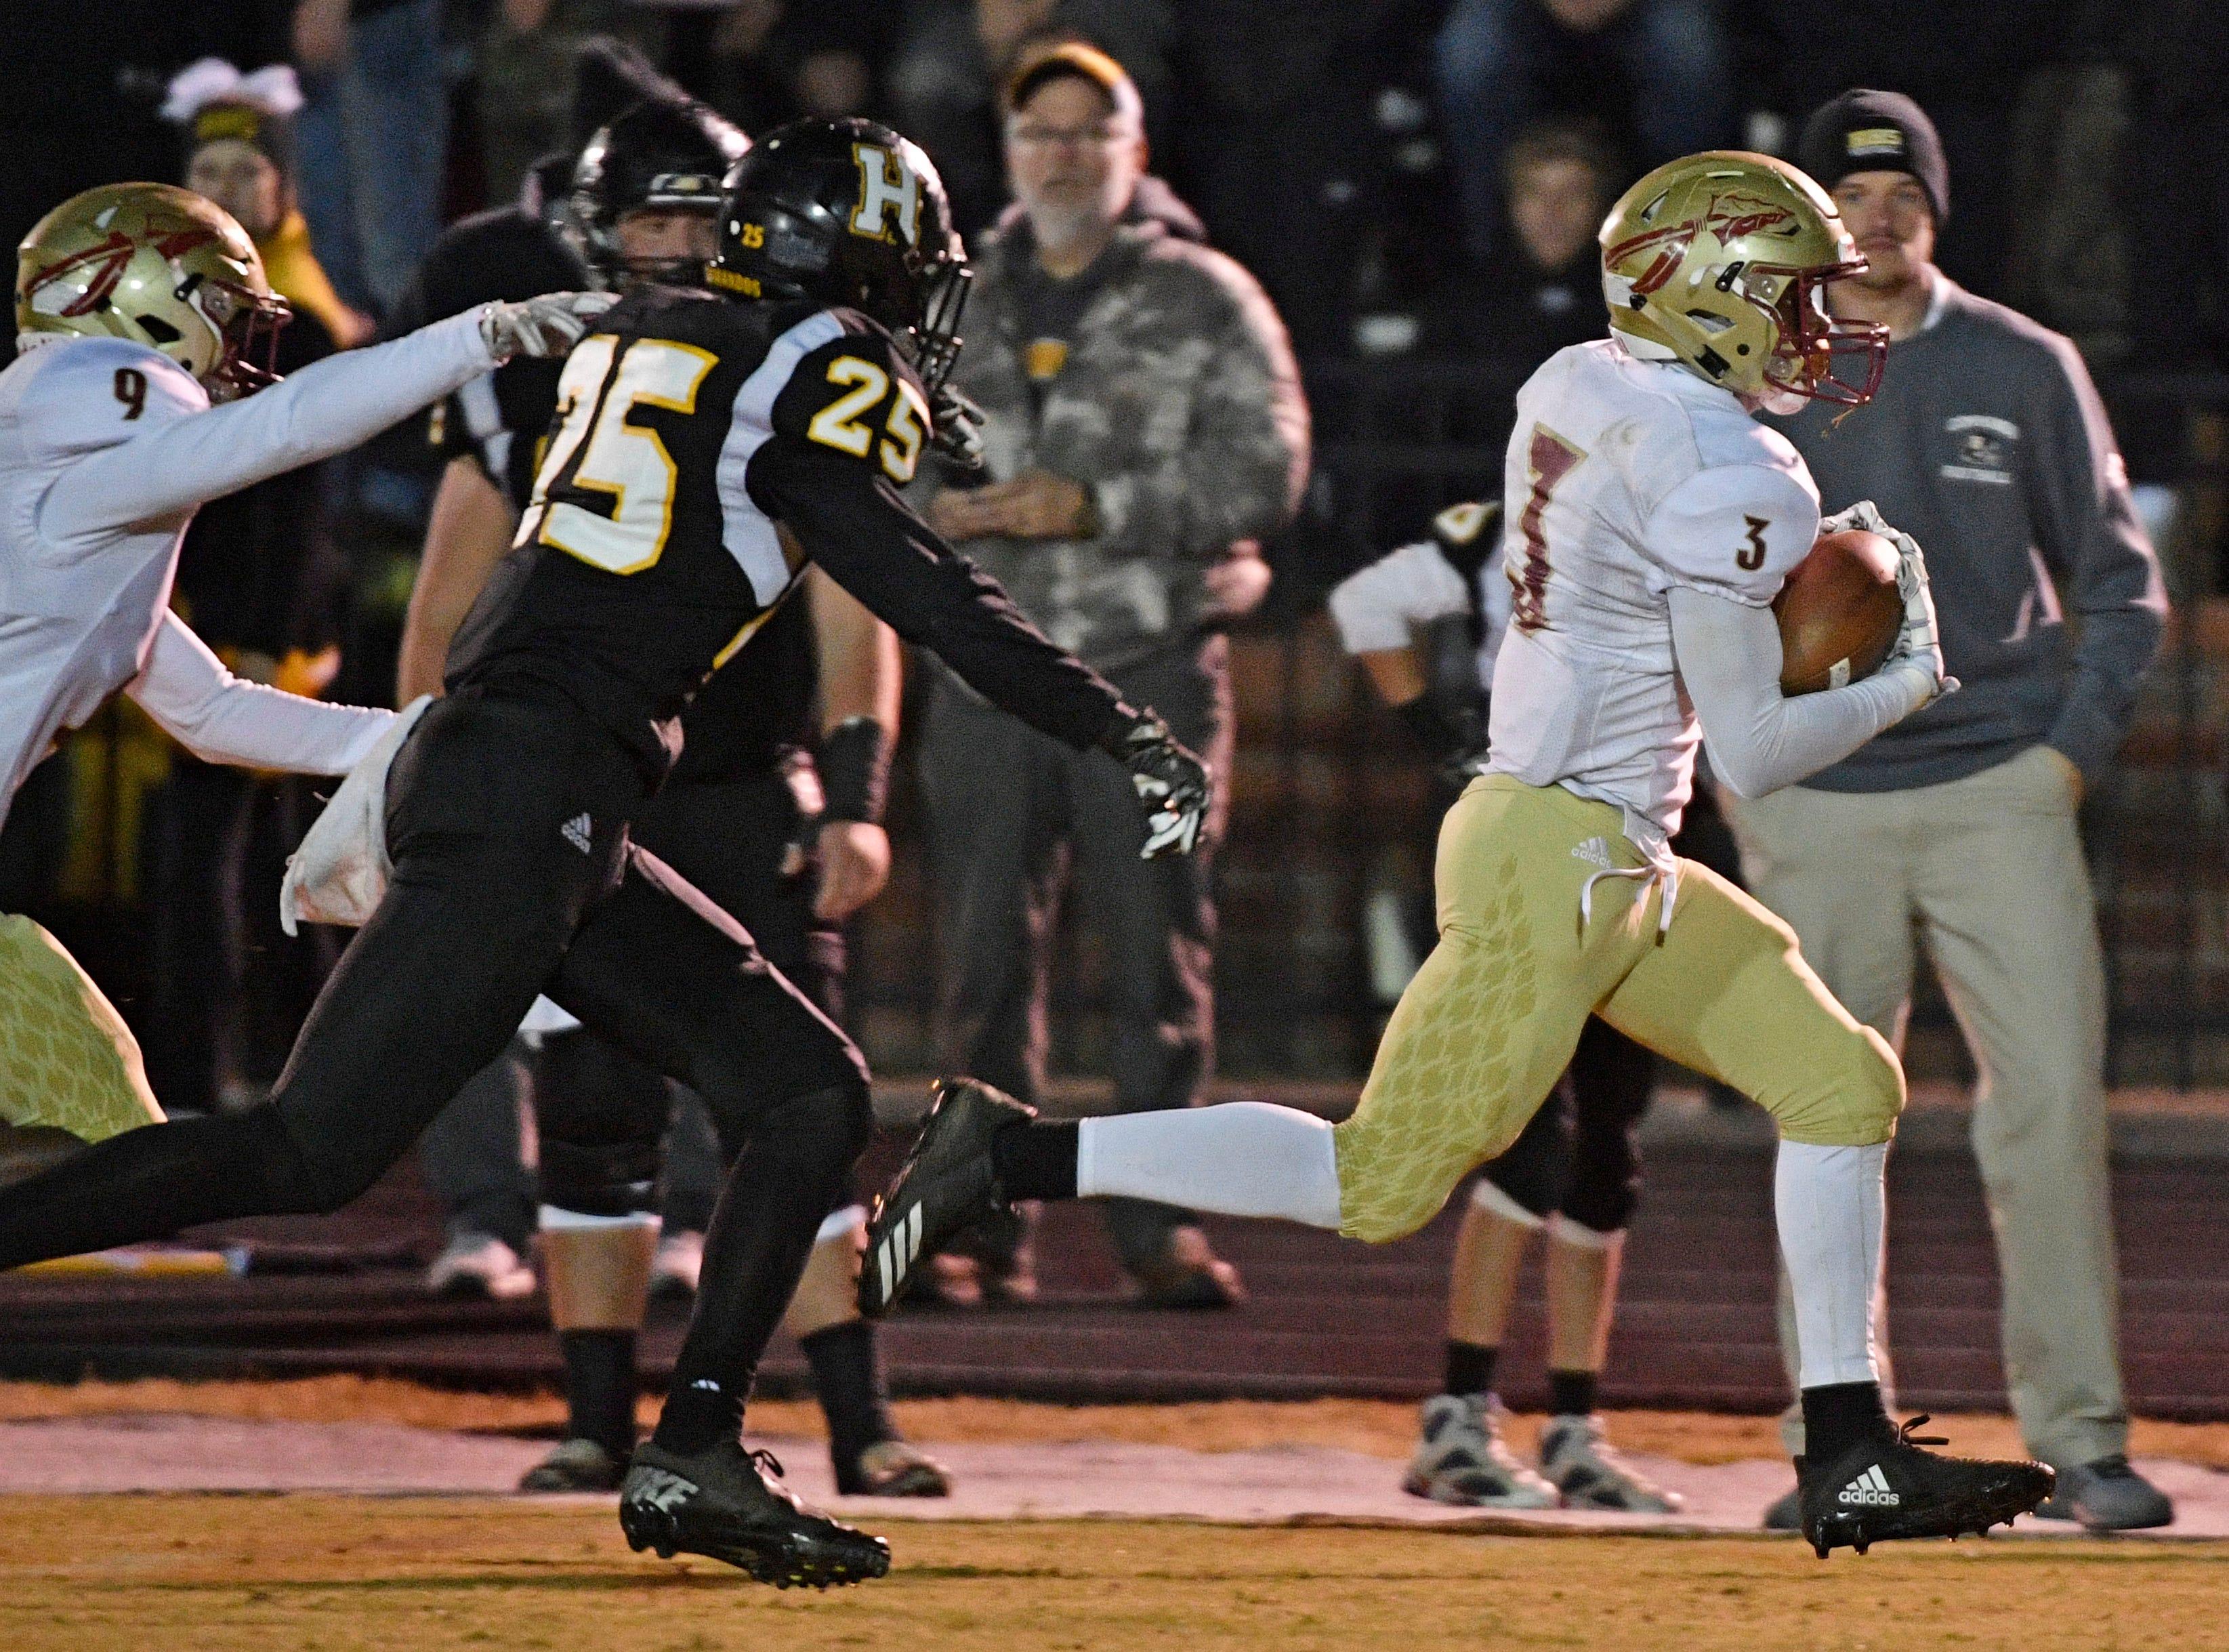 A fake punt gave Jaylan Simmons a 20 yard run as Riverdale plays at Hendersonville Friday Nov. 2, 2018, in Hendersonville, Tenn.